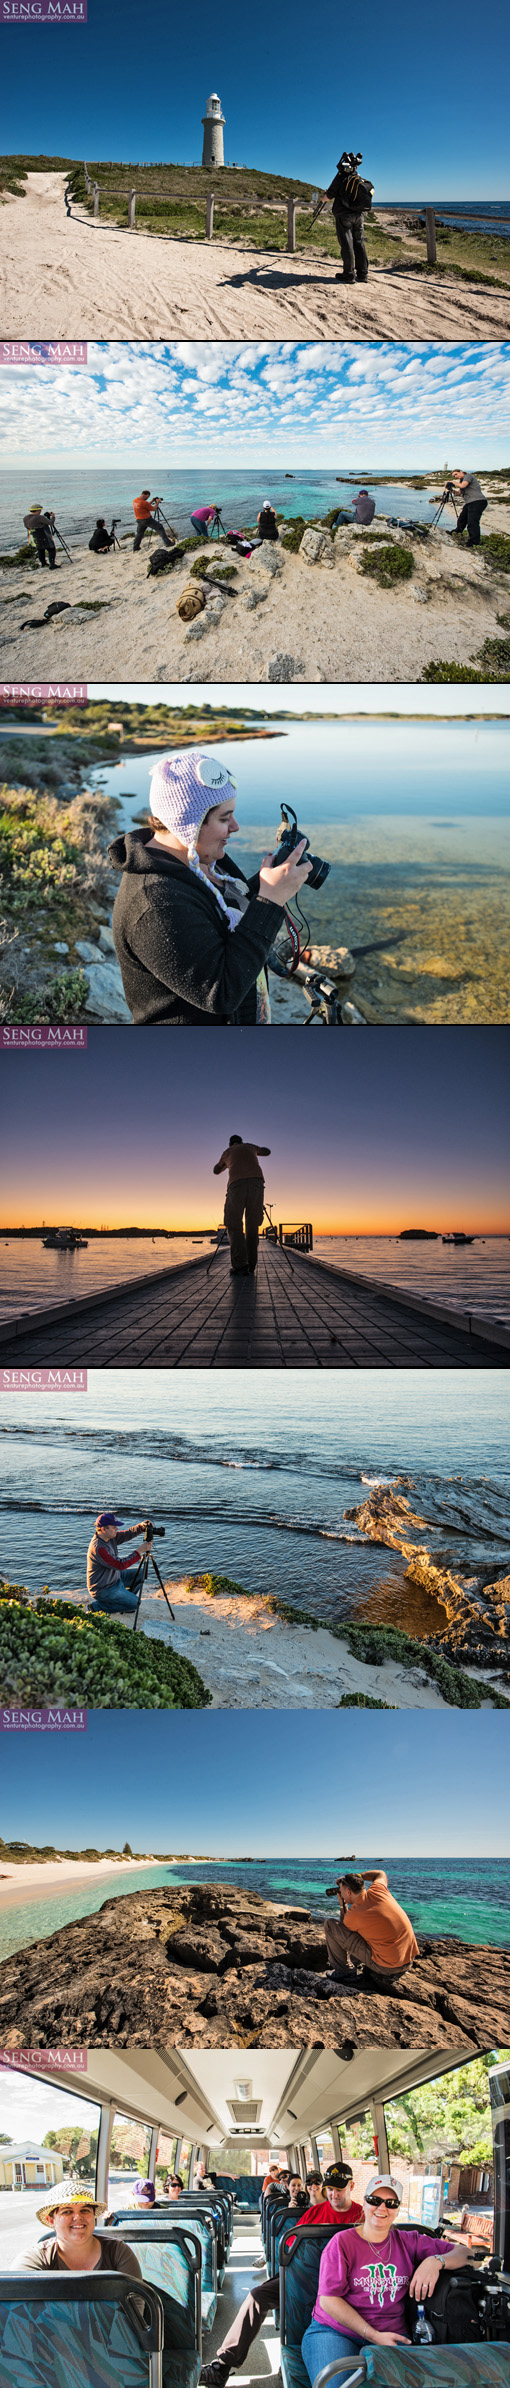 Rottnest Island Photo Safari - Landscape Photography Workshop